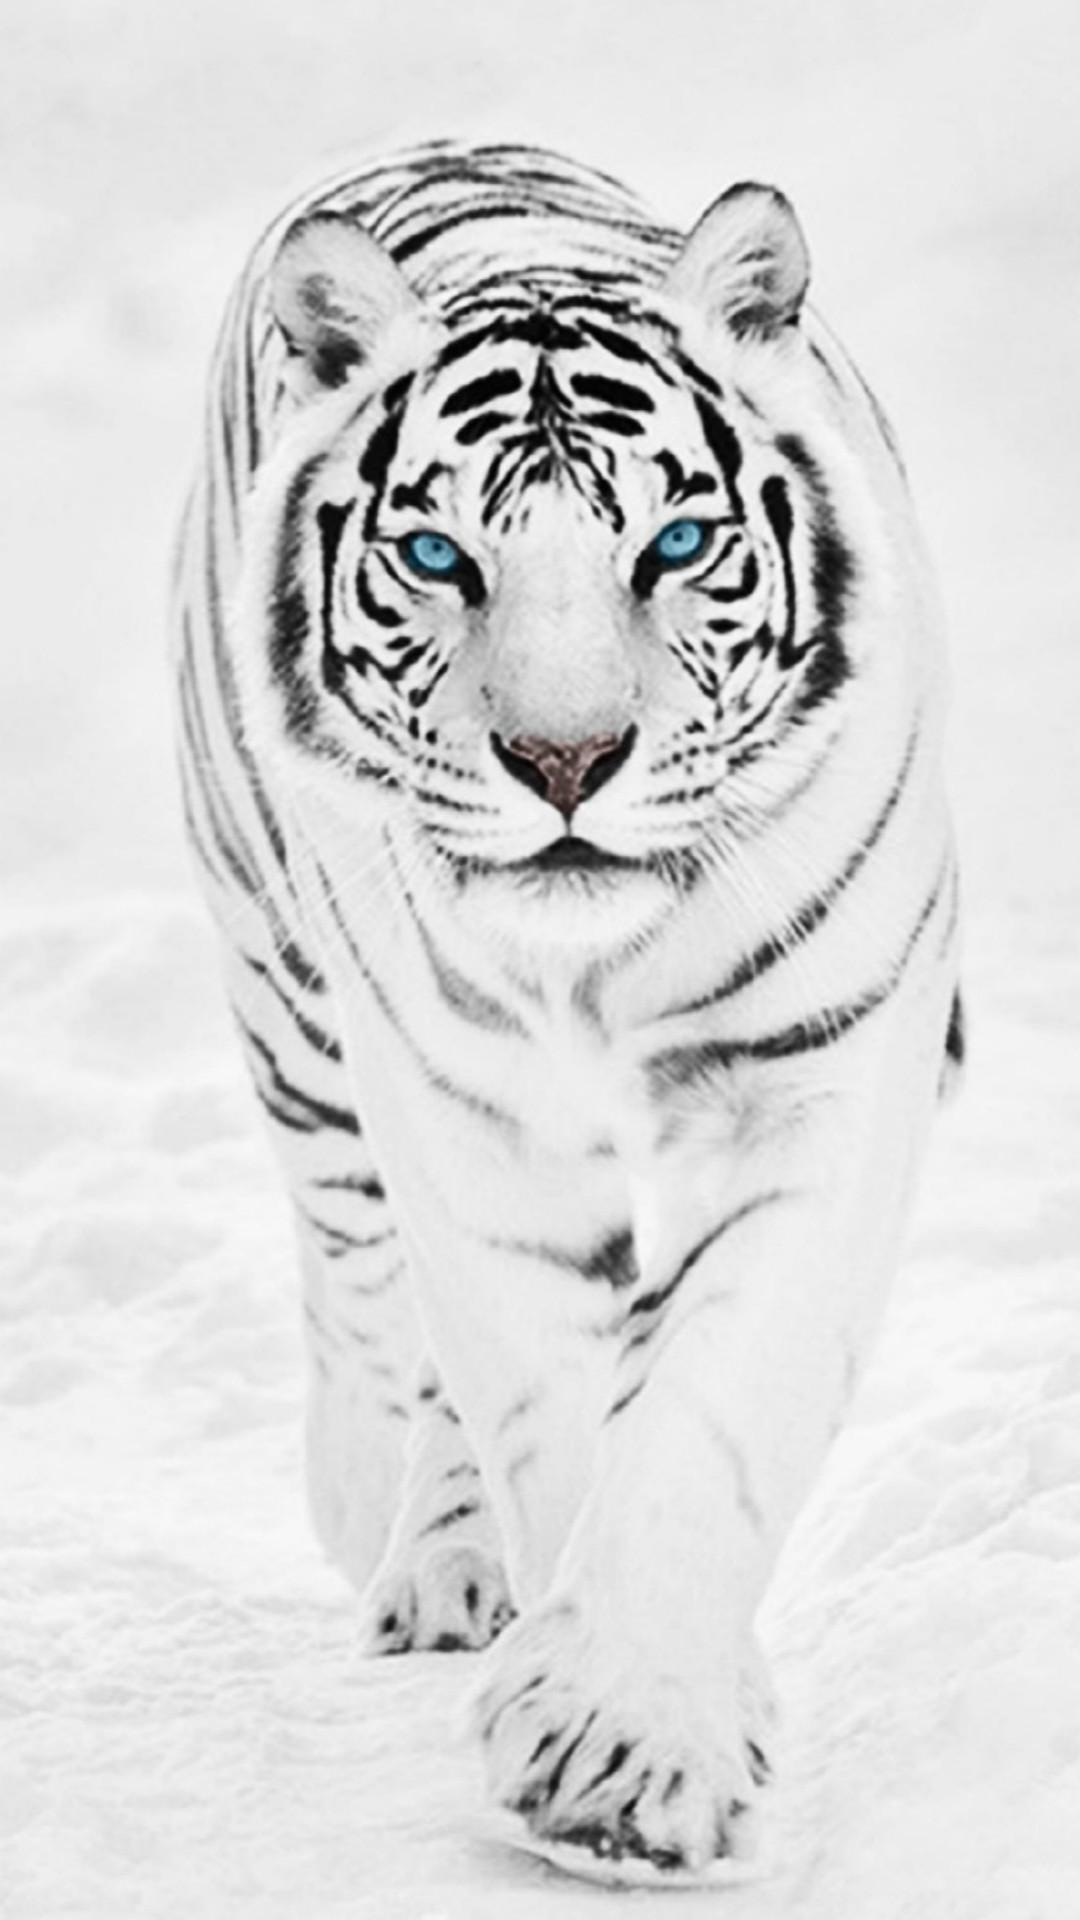 Siberian Tiger Wallpapers – Wallpaper Cave   Best Games Wallpapers    Pinterest   Siberian tiger and Tiger wallpaper